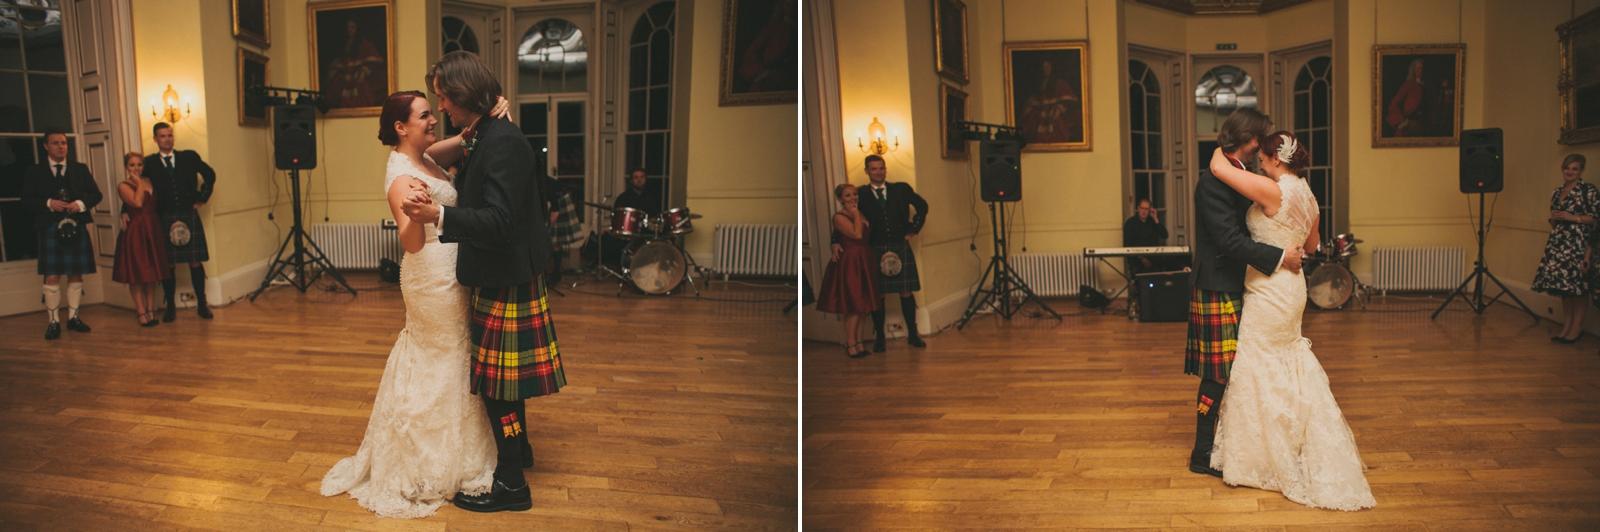 Emma+Ali-Wedding-463.JPG